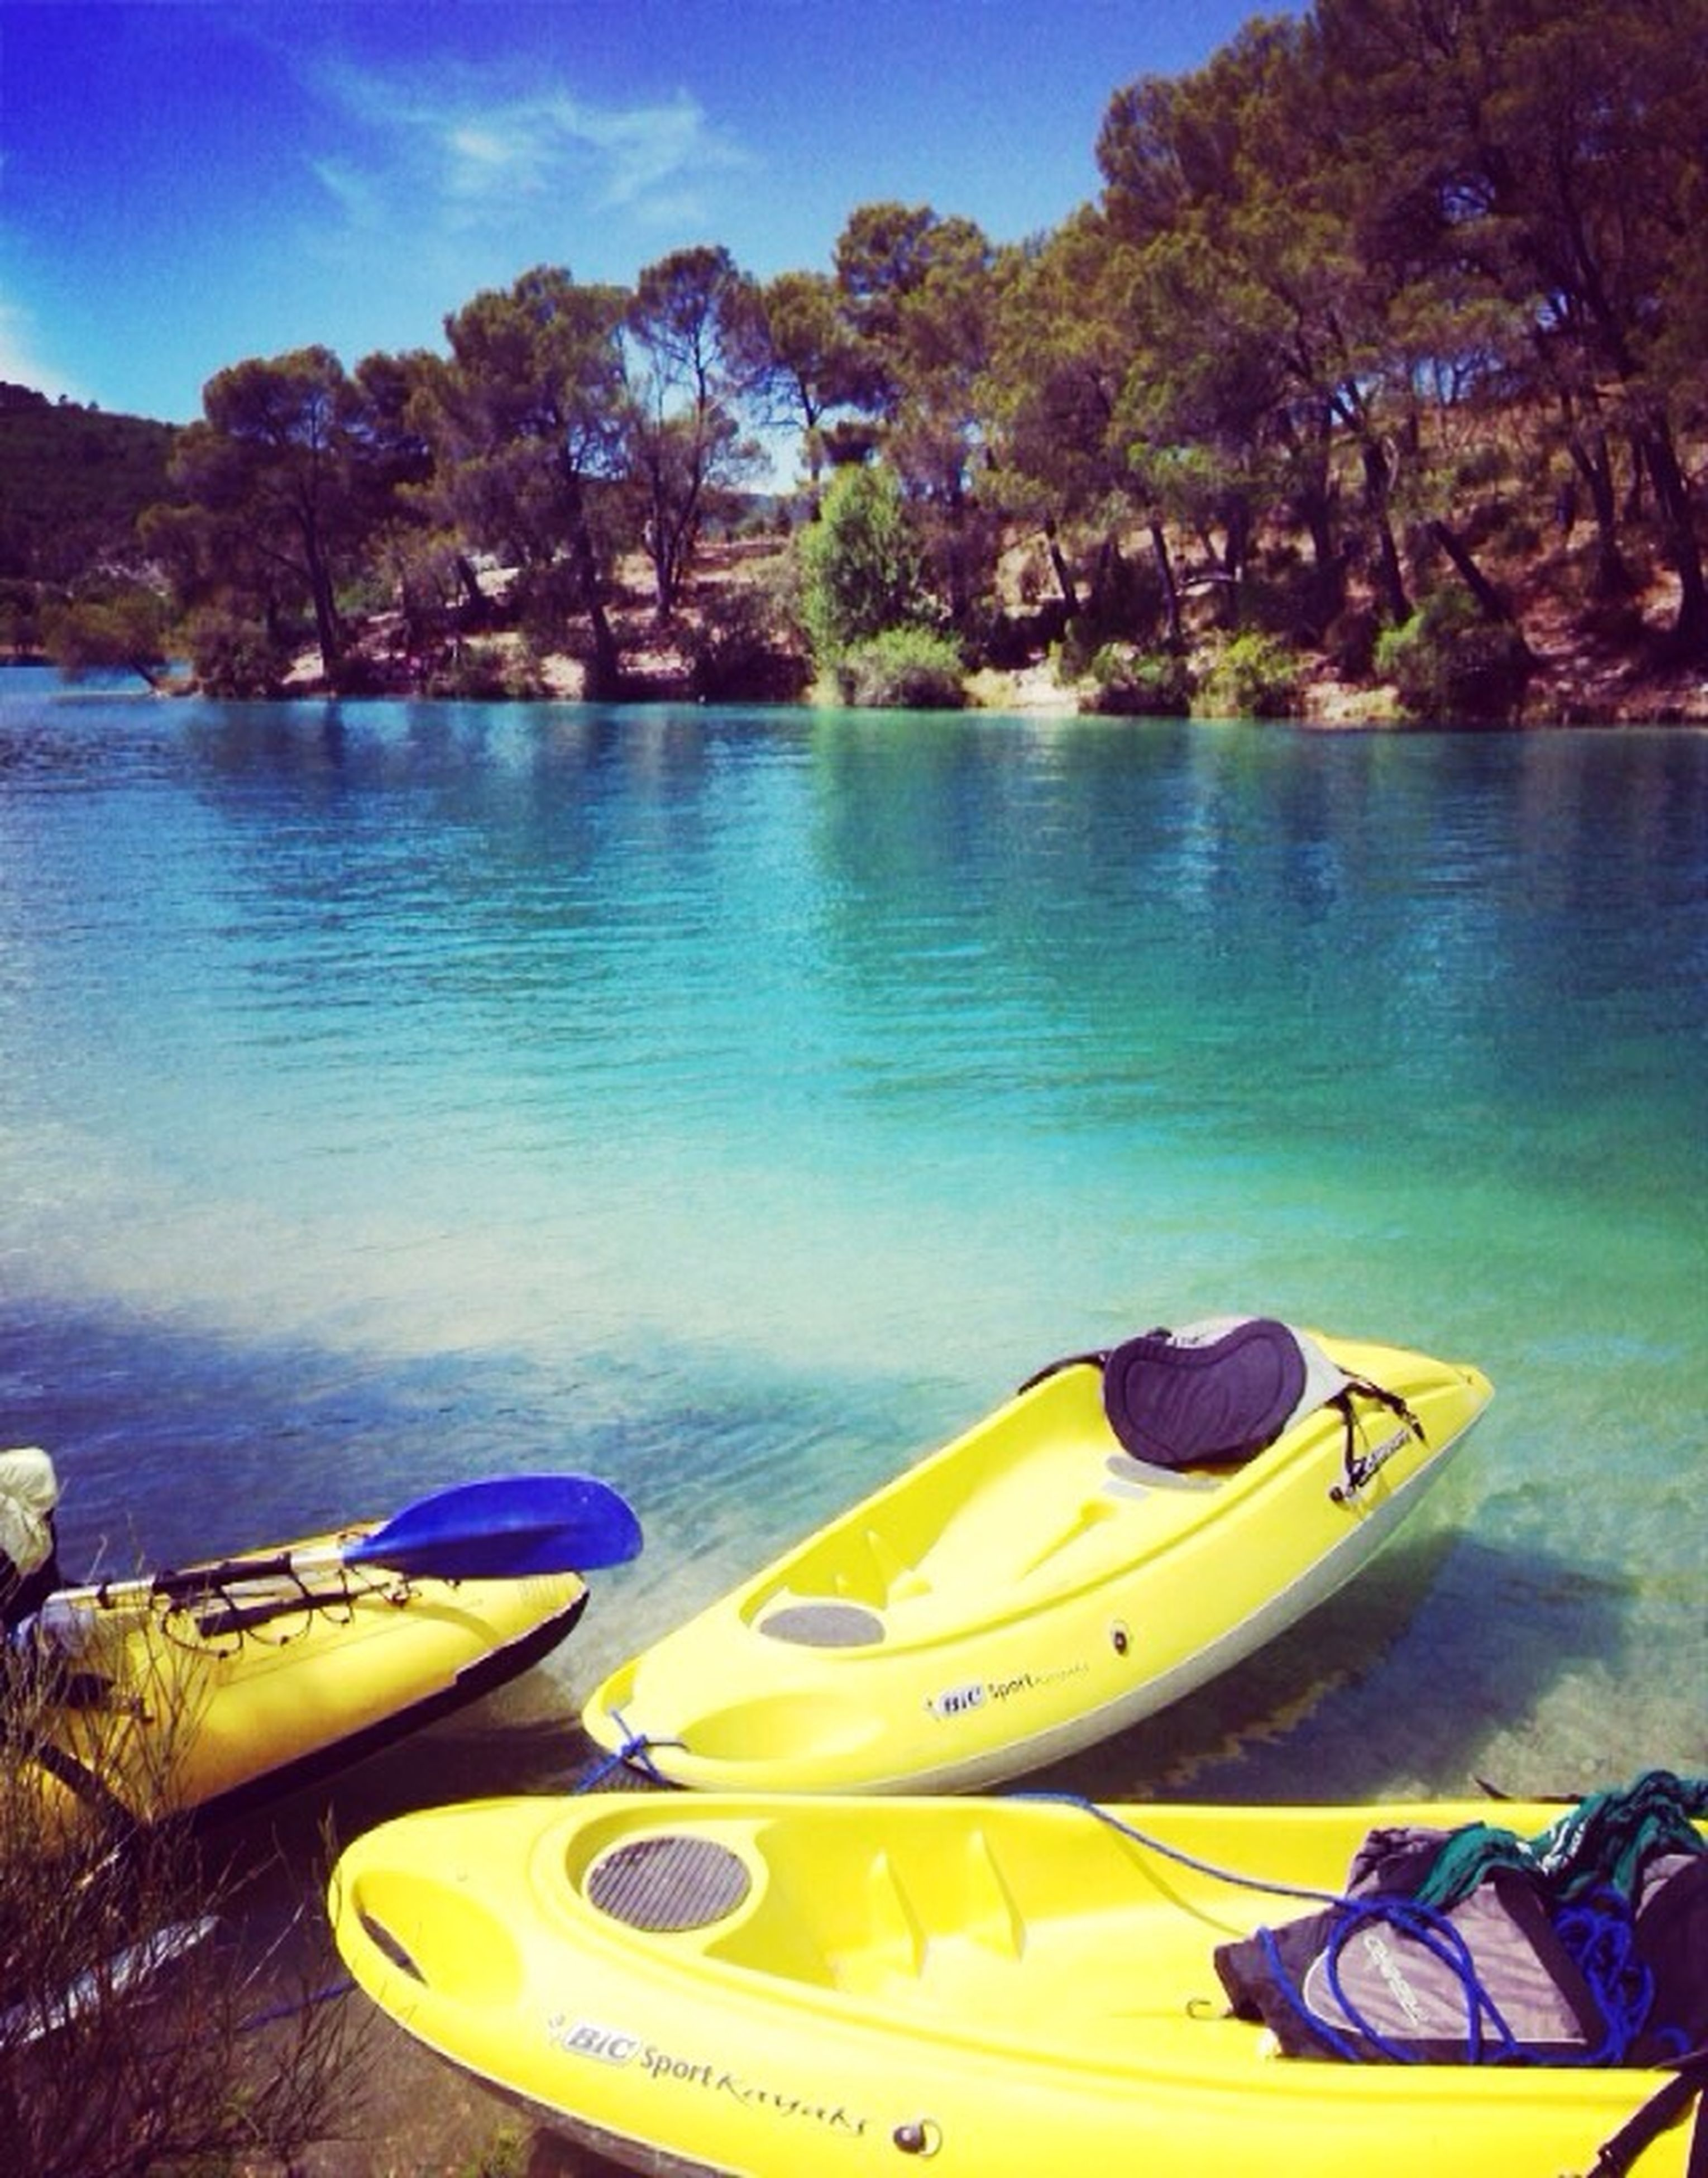 First Eyeem Photo Yellow Tranquil Scene Verdon Gorge Kayak Water Beauty In Nature